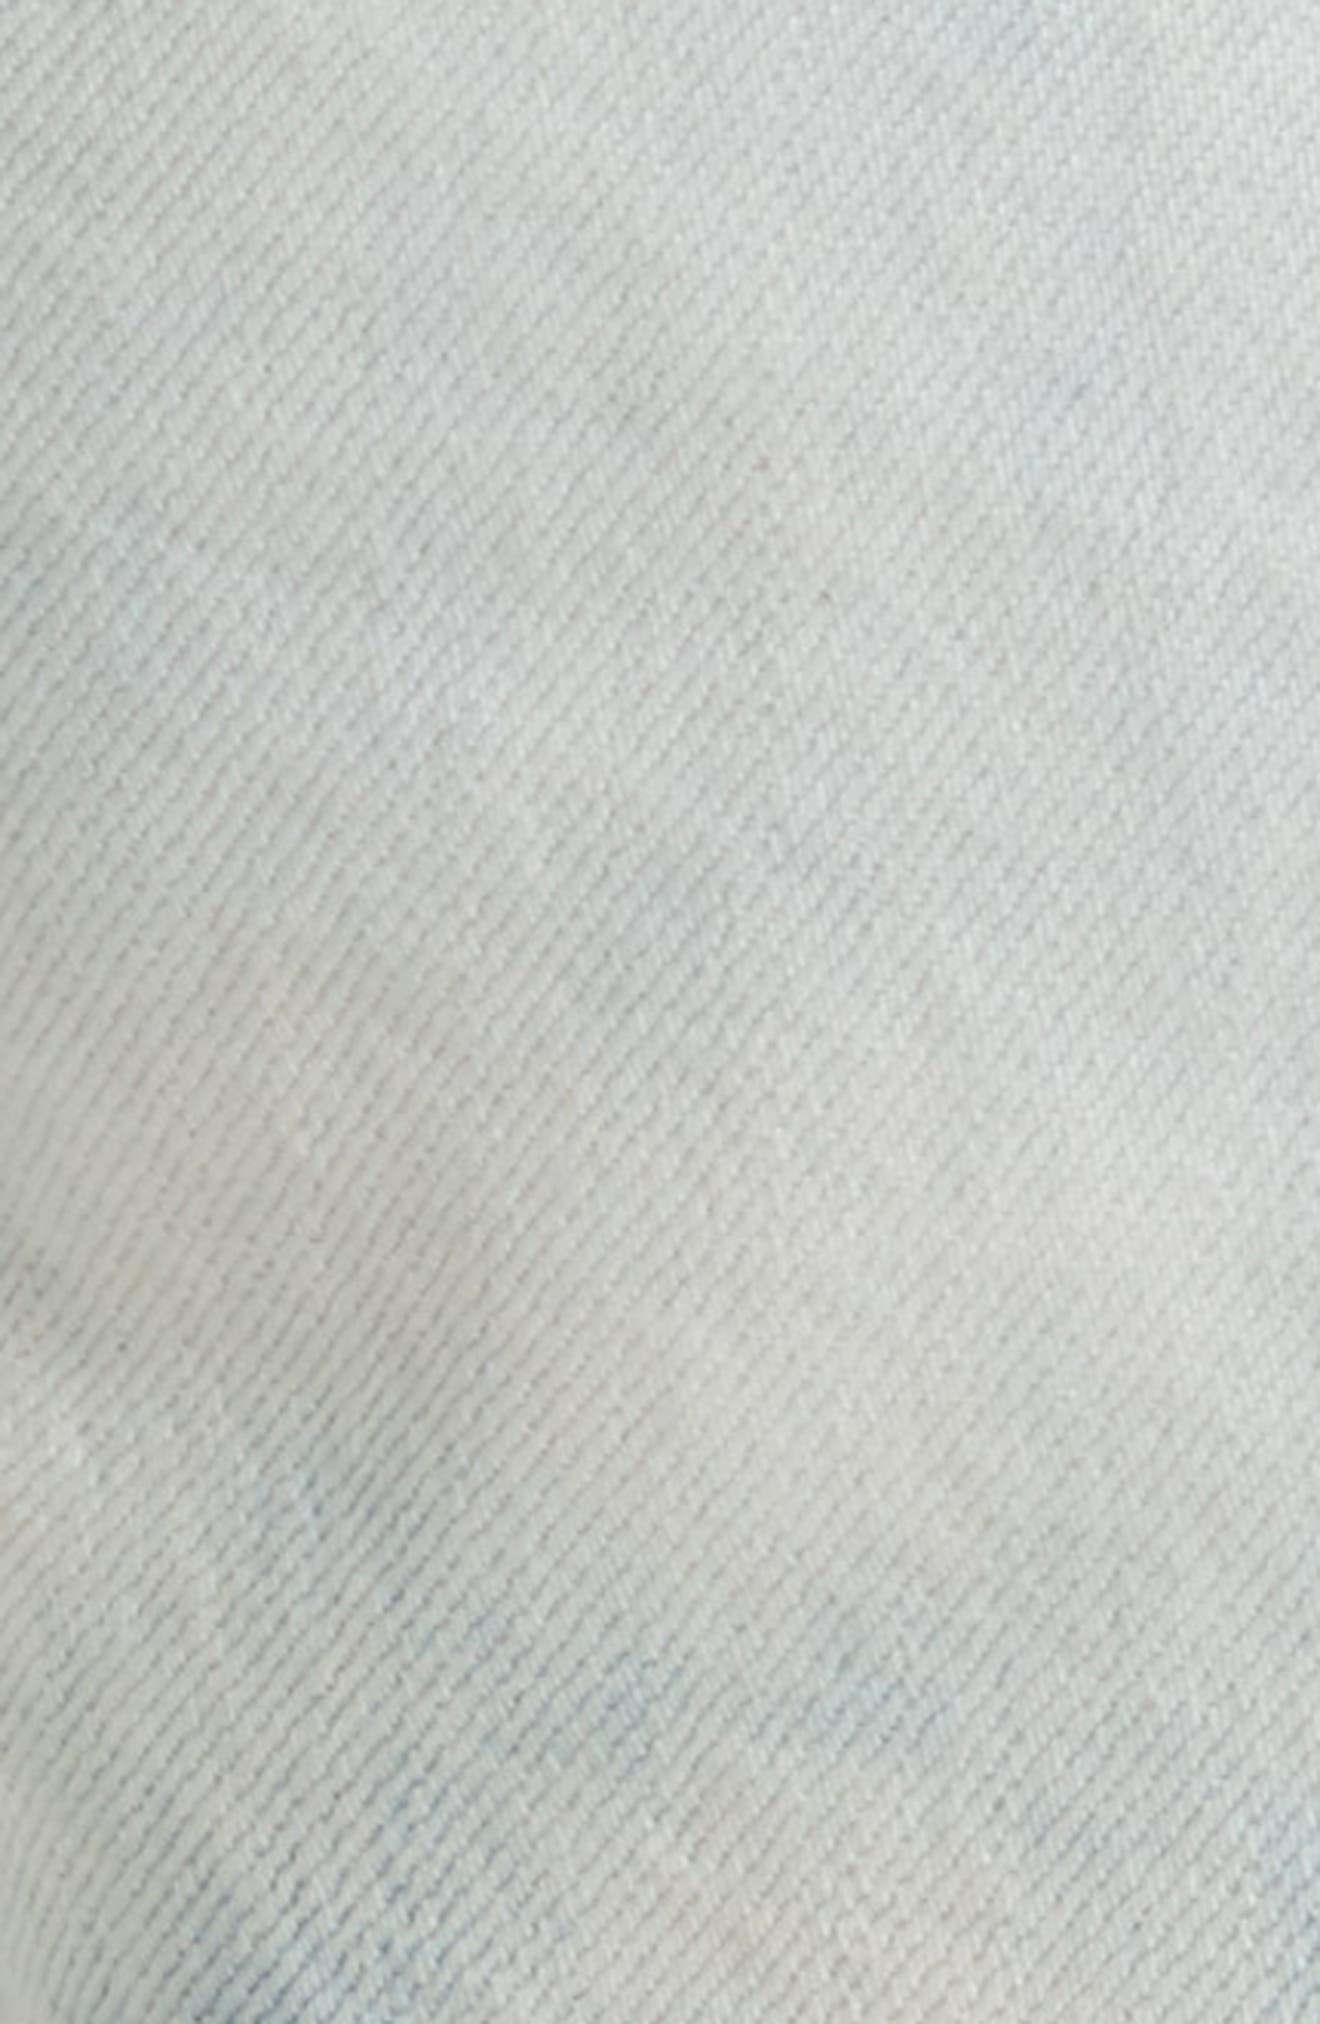 Cutoff Denim Shorts,                             Alternate thumbnail 5, color,                             490